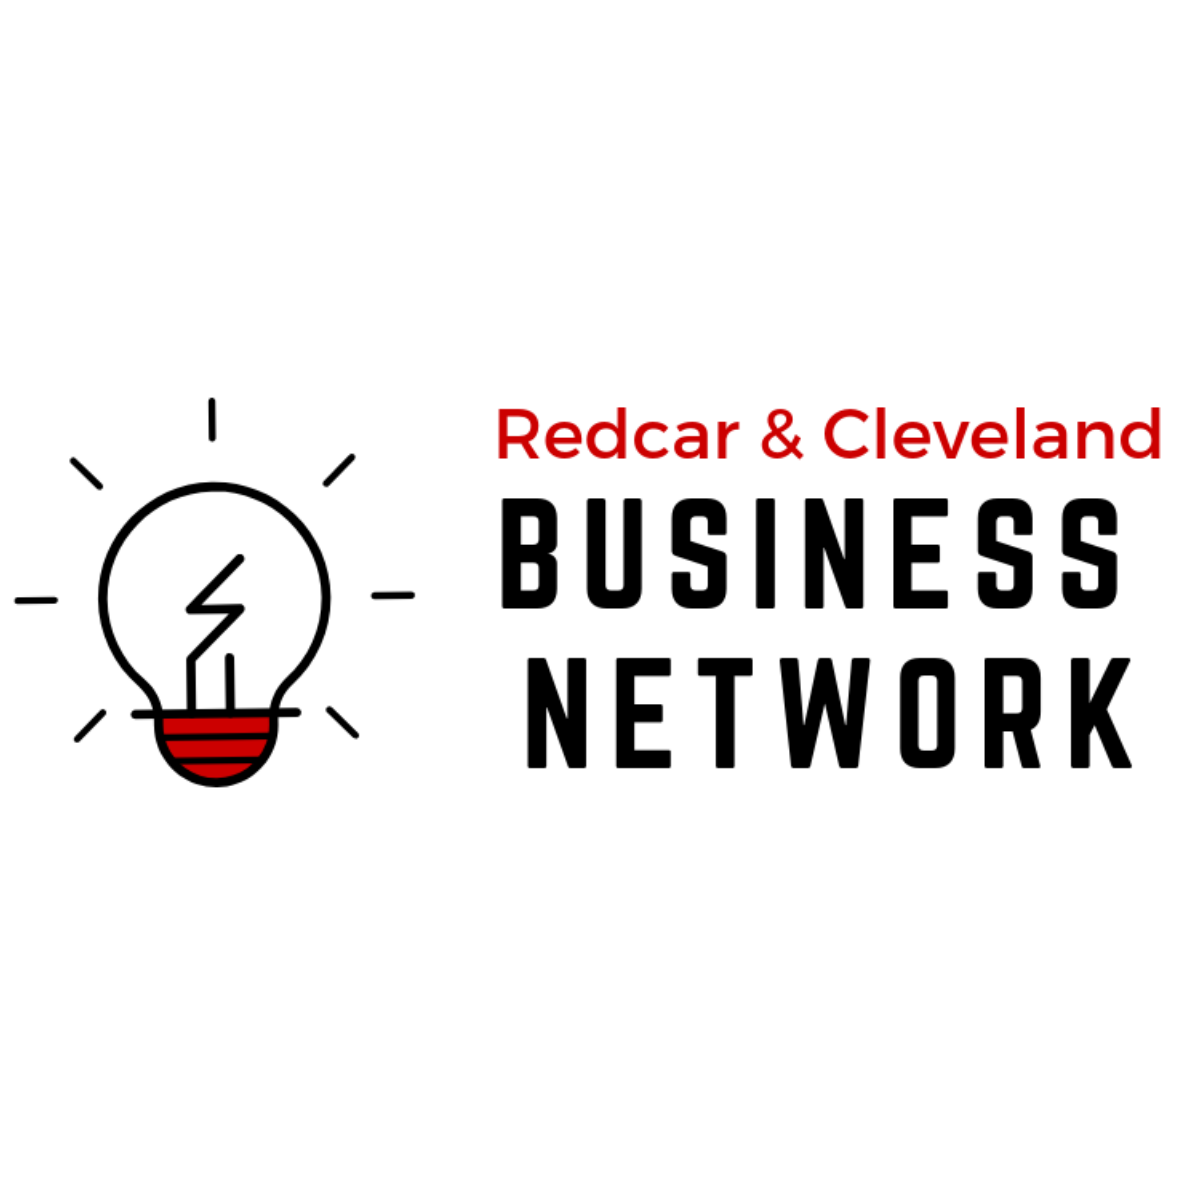 R&C Network